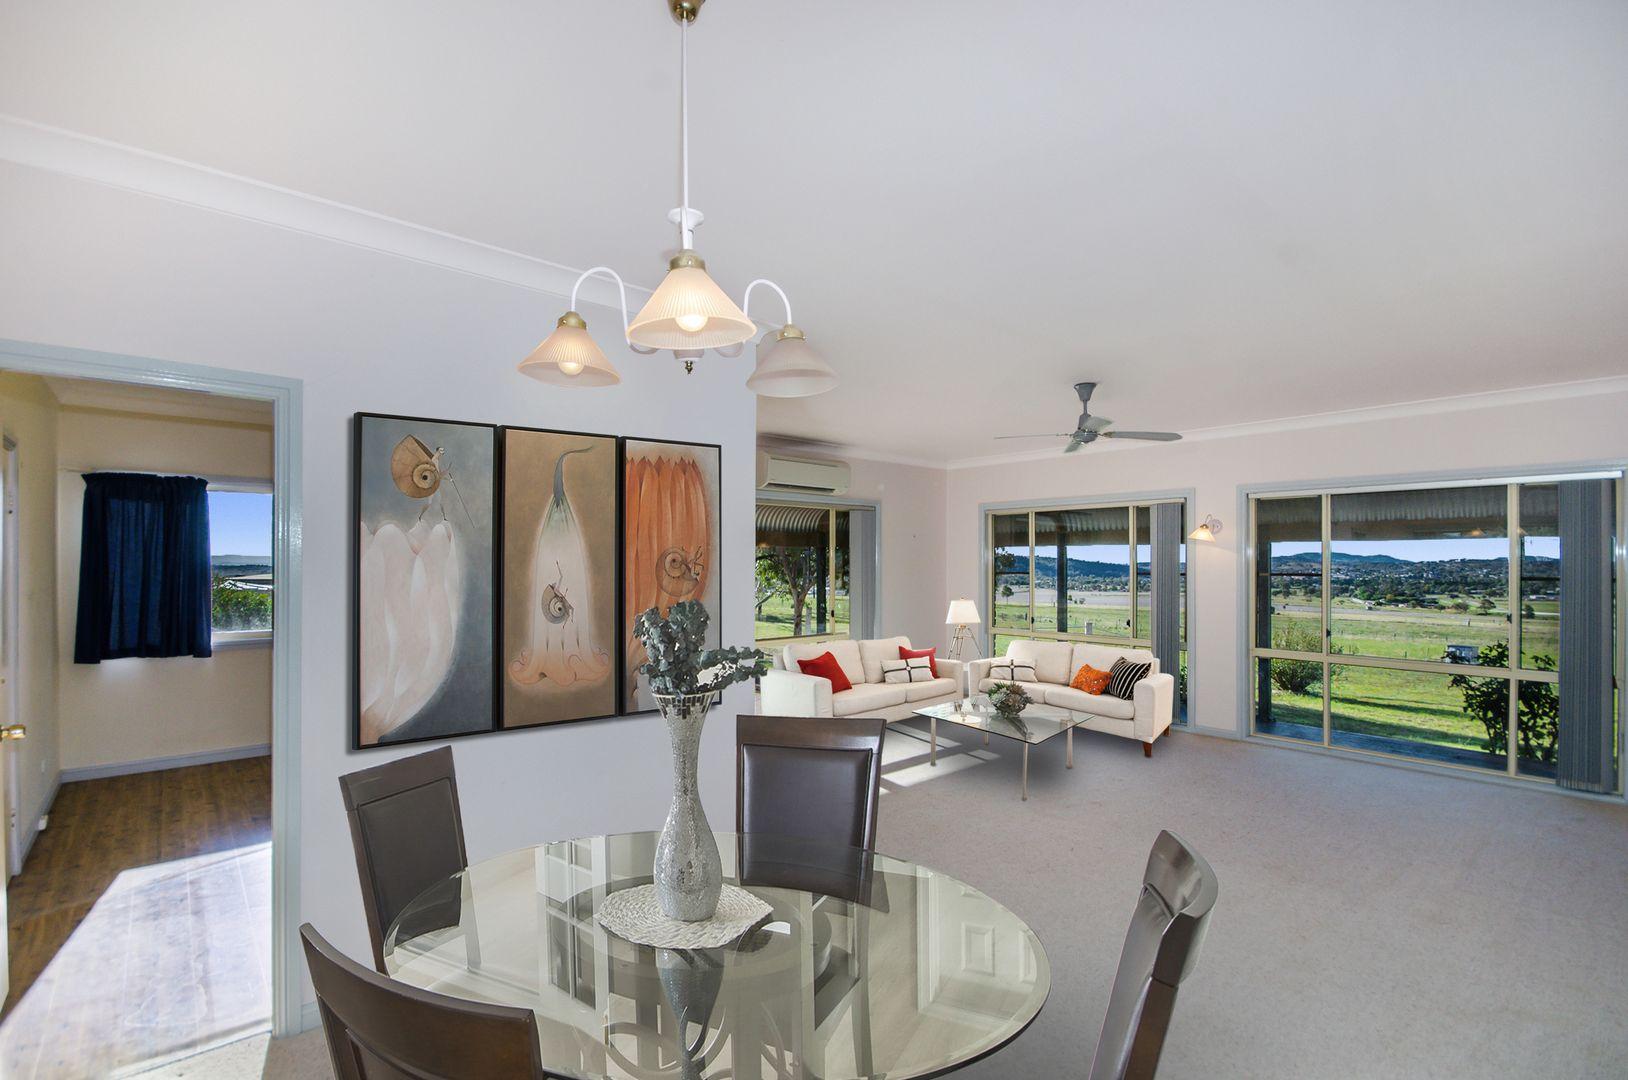 35 Annies Lane, Quirindi NSW 2343, Image 2